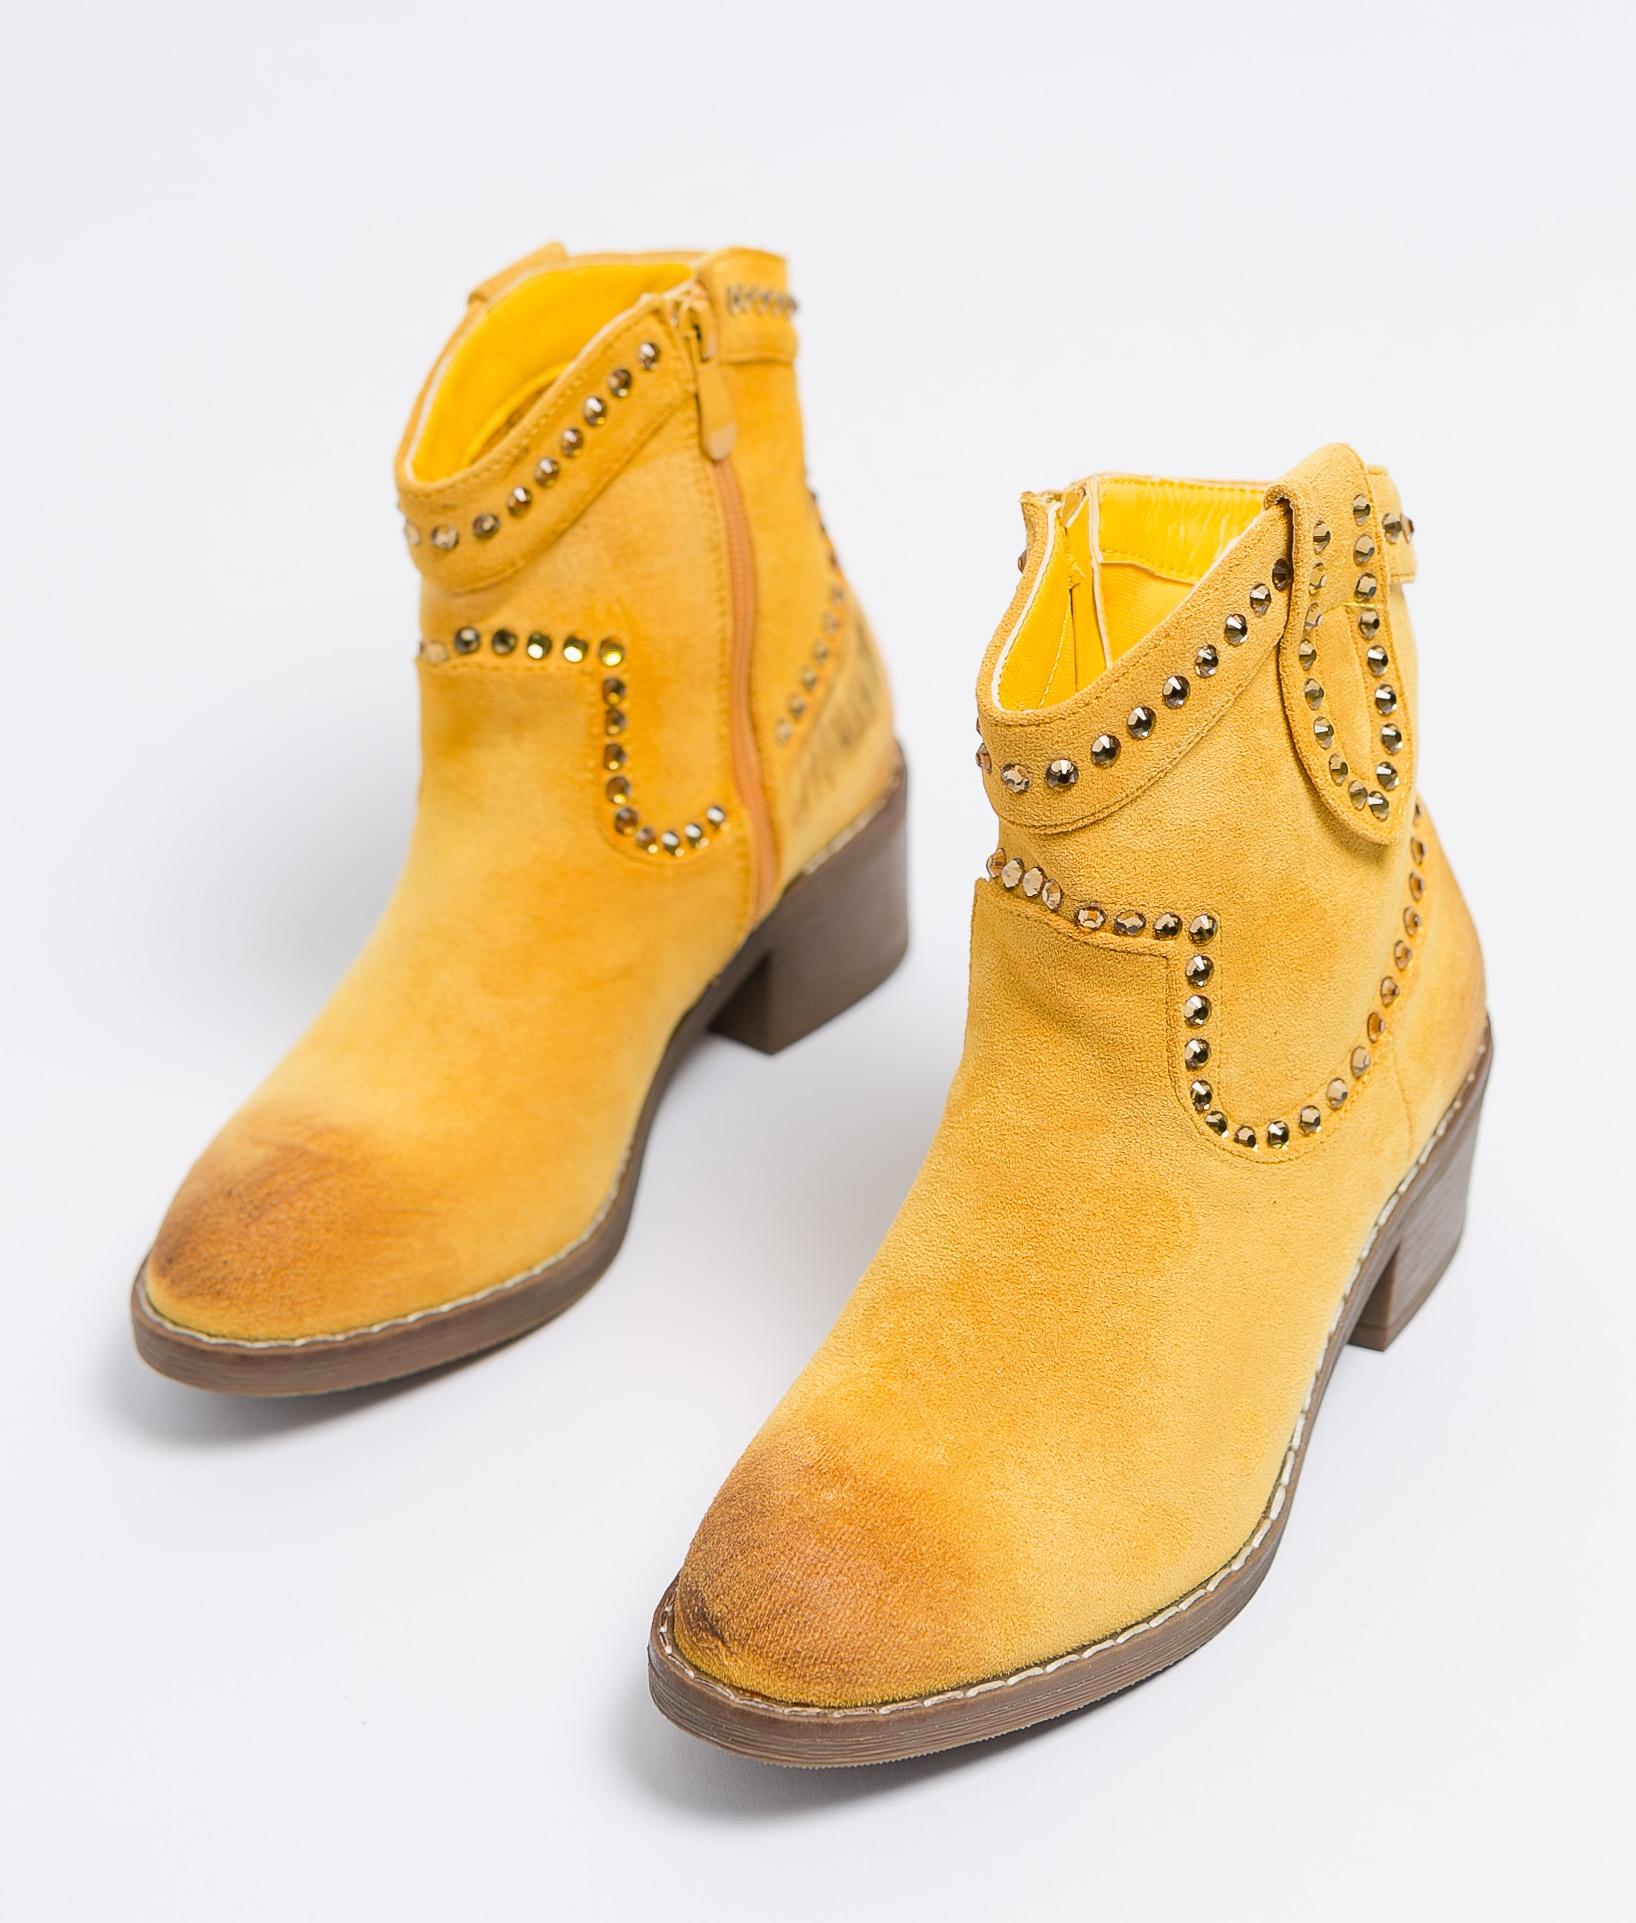 Bota Baja Calia - Amarillo